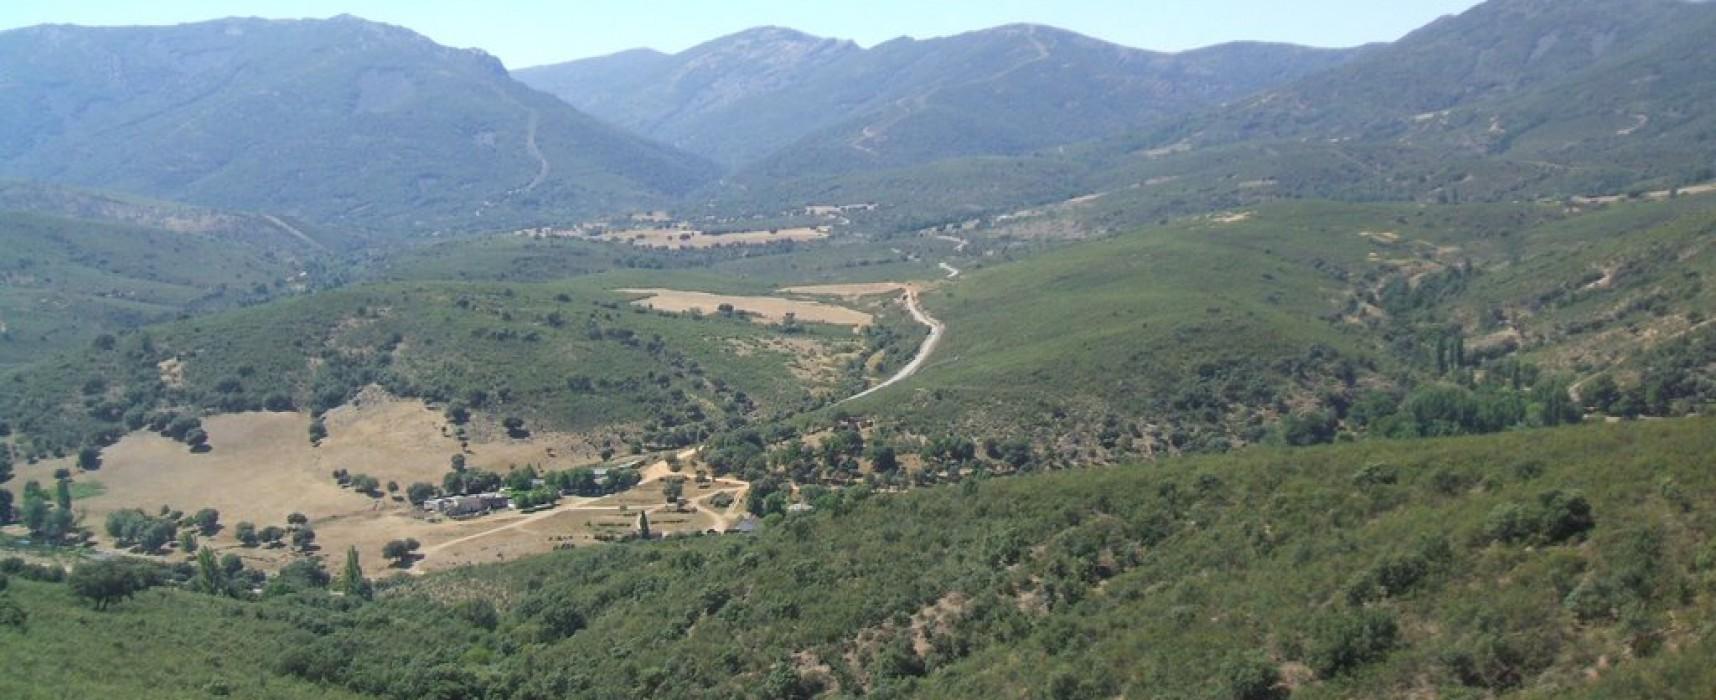 Varapalo judicial a Cospedal por privatizar tres montes públicos